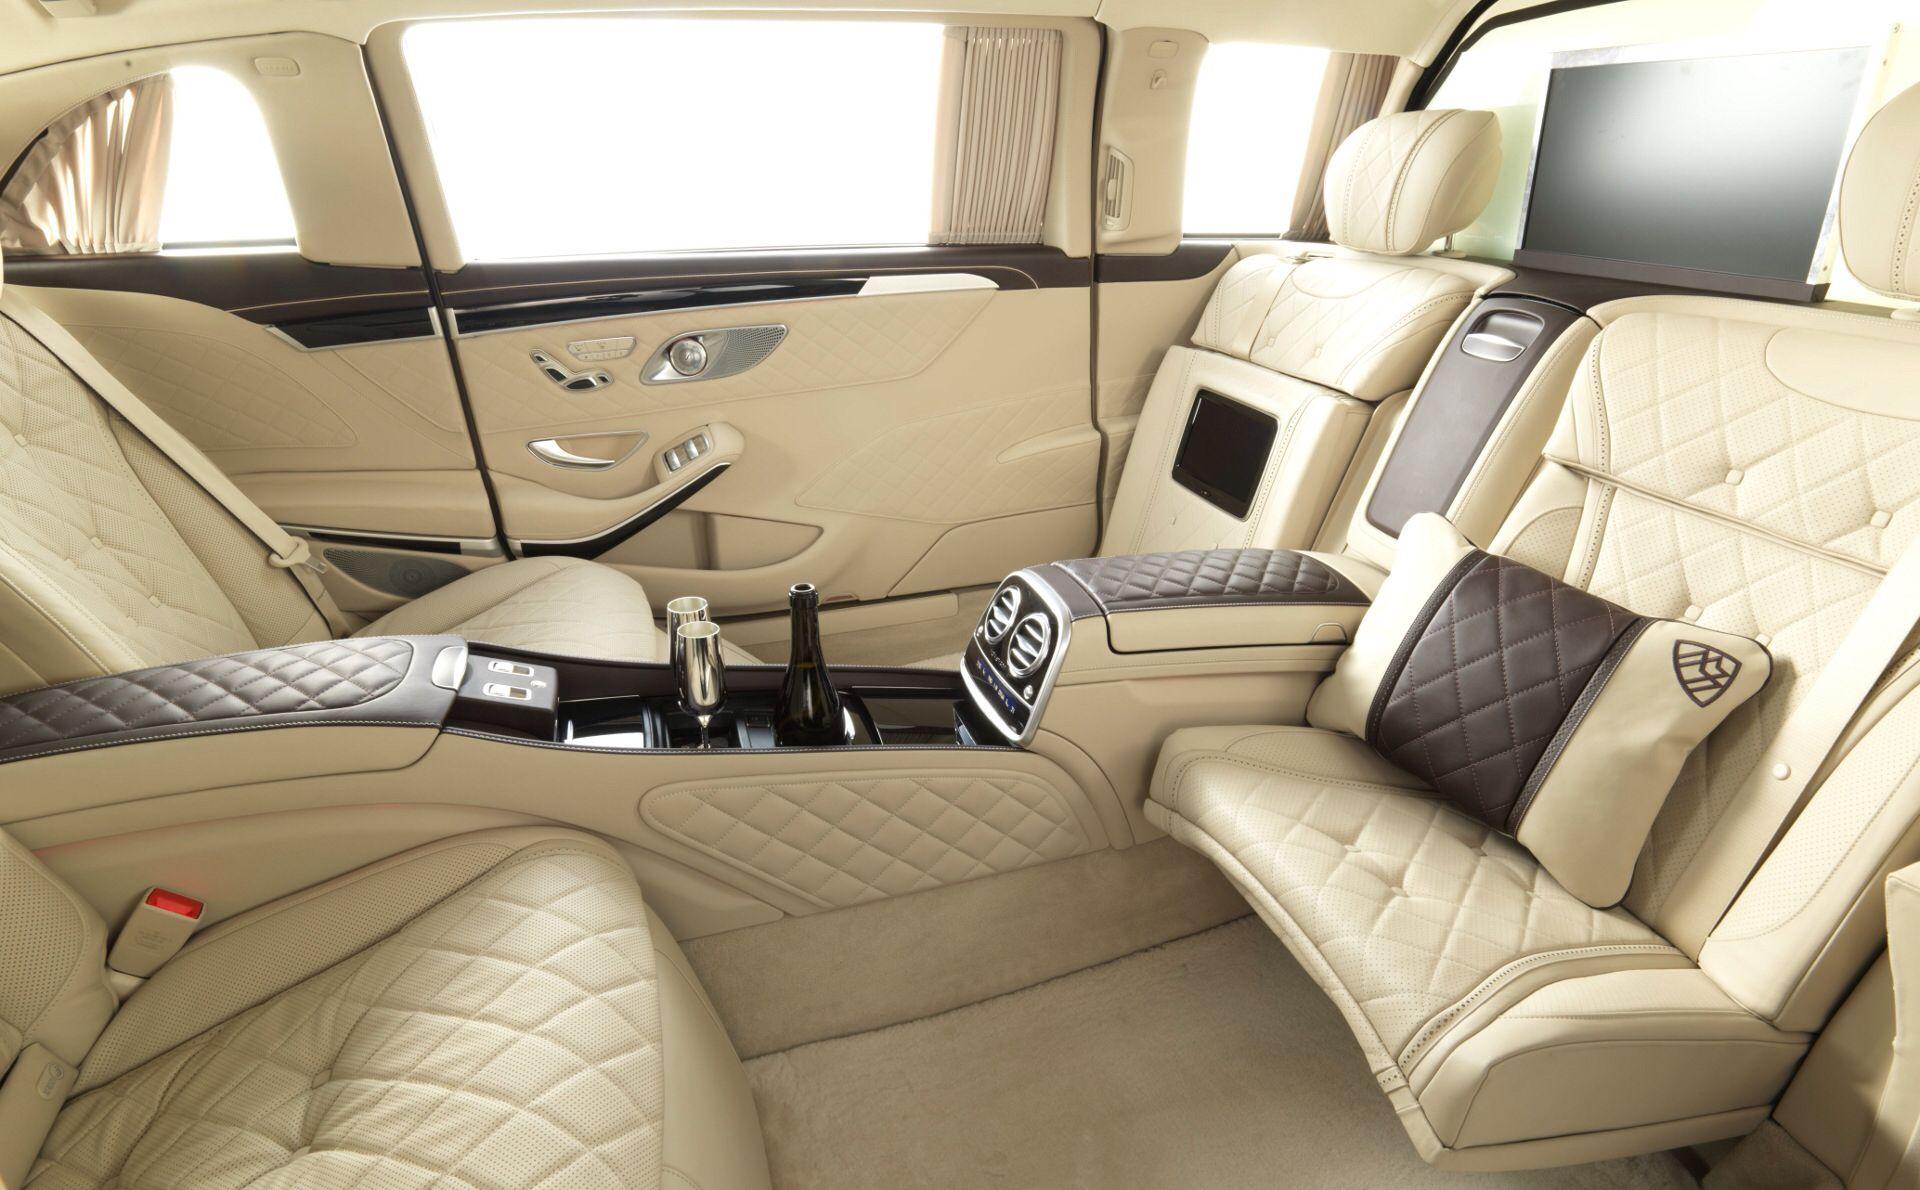 Mercedes-Benz S600 Pullman Maybach (2016)